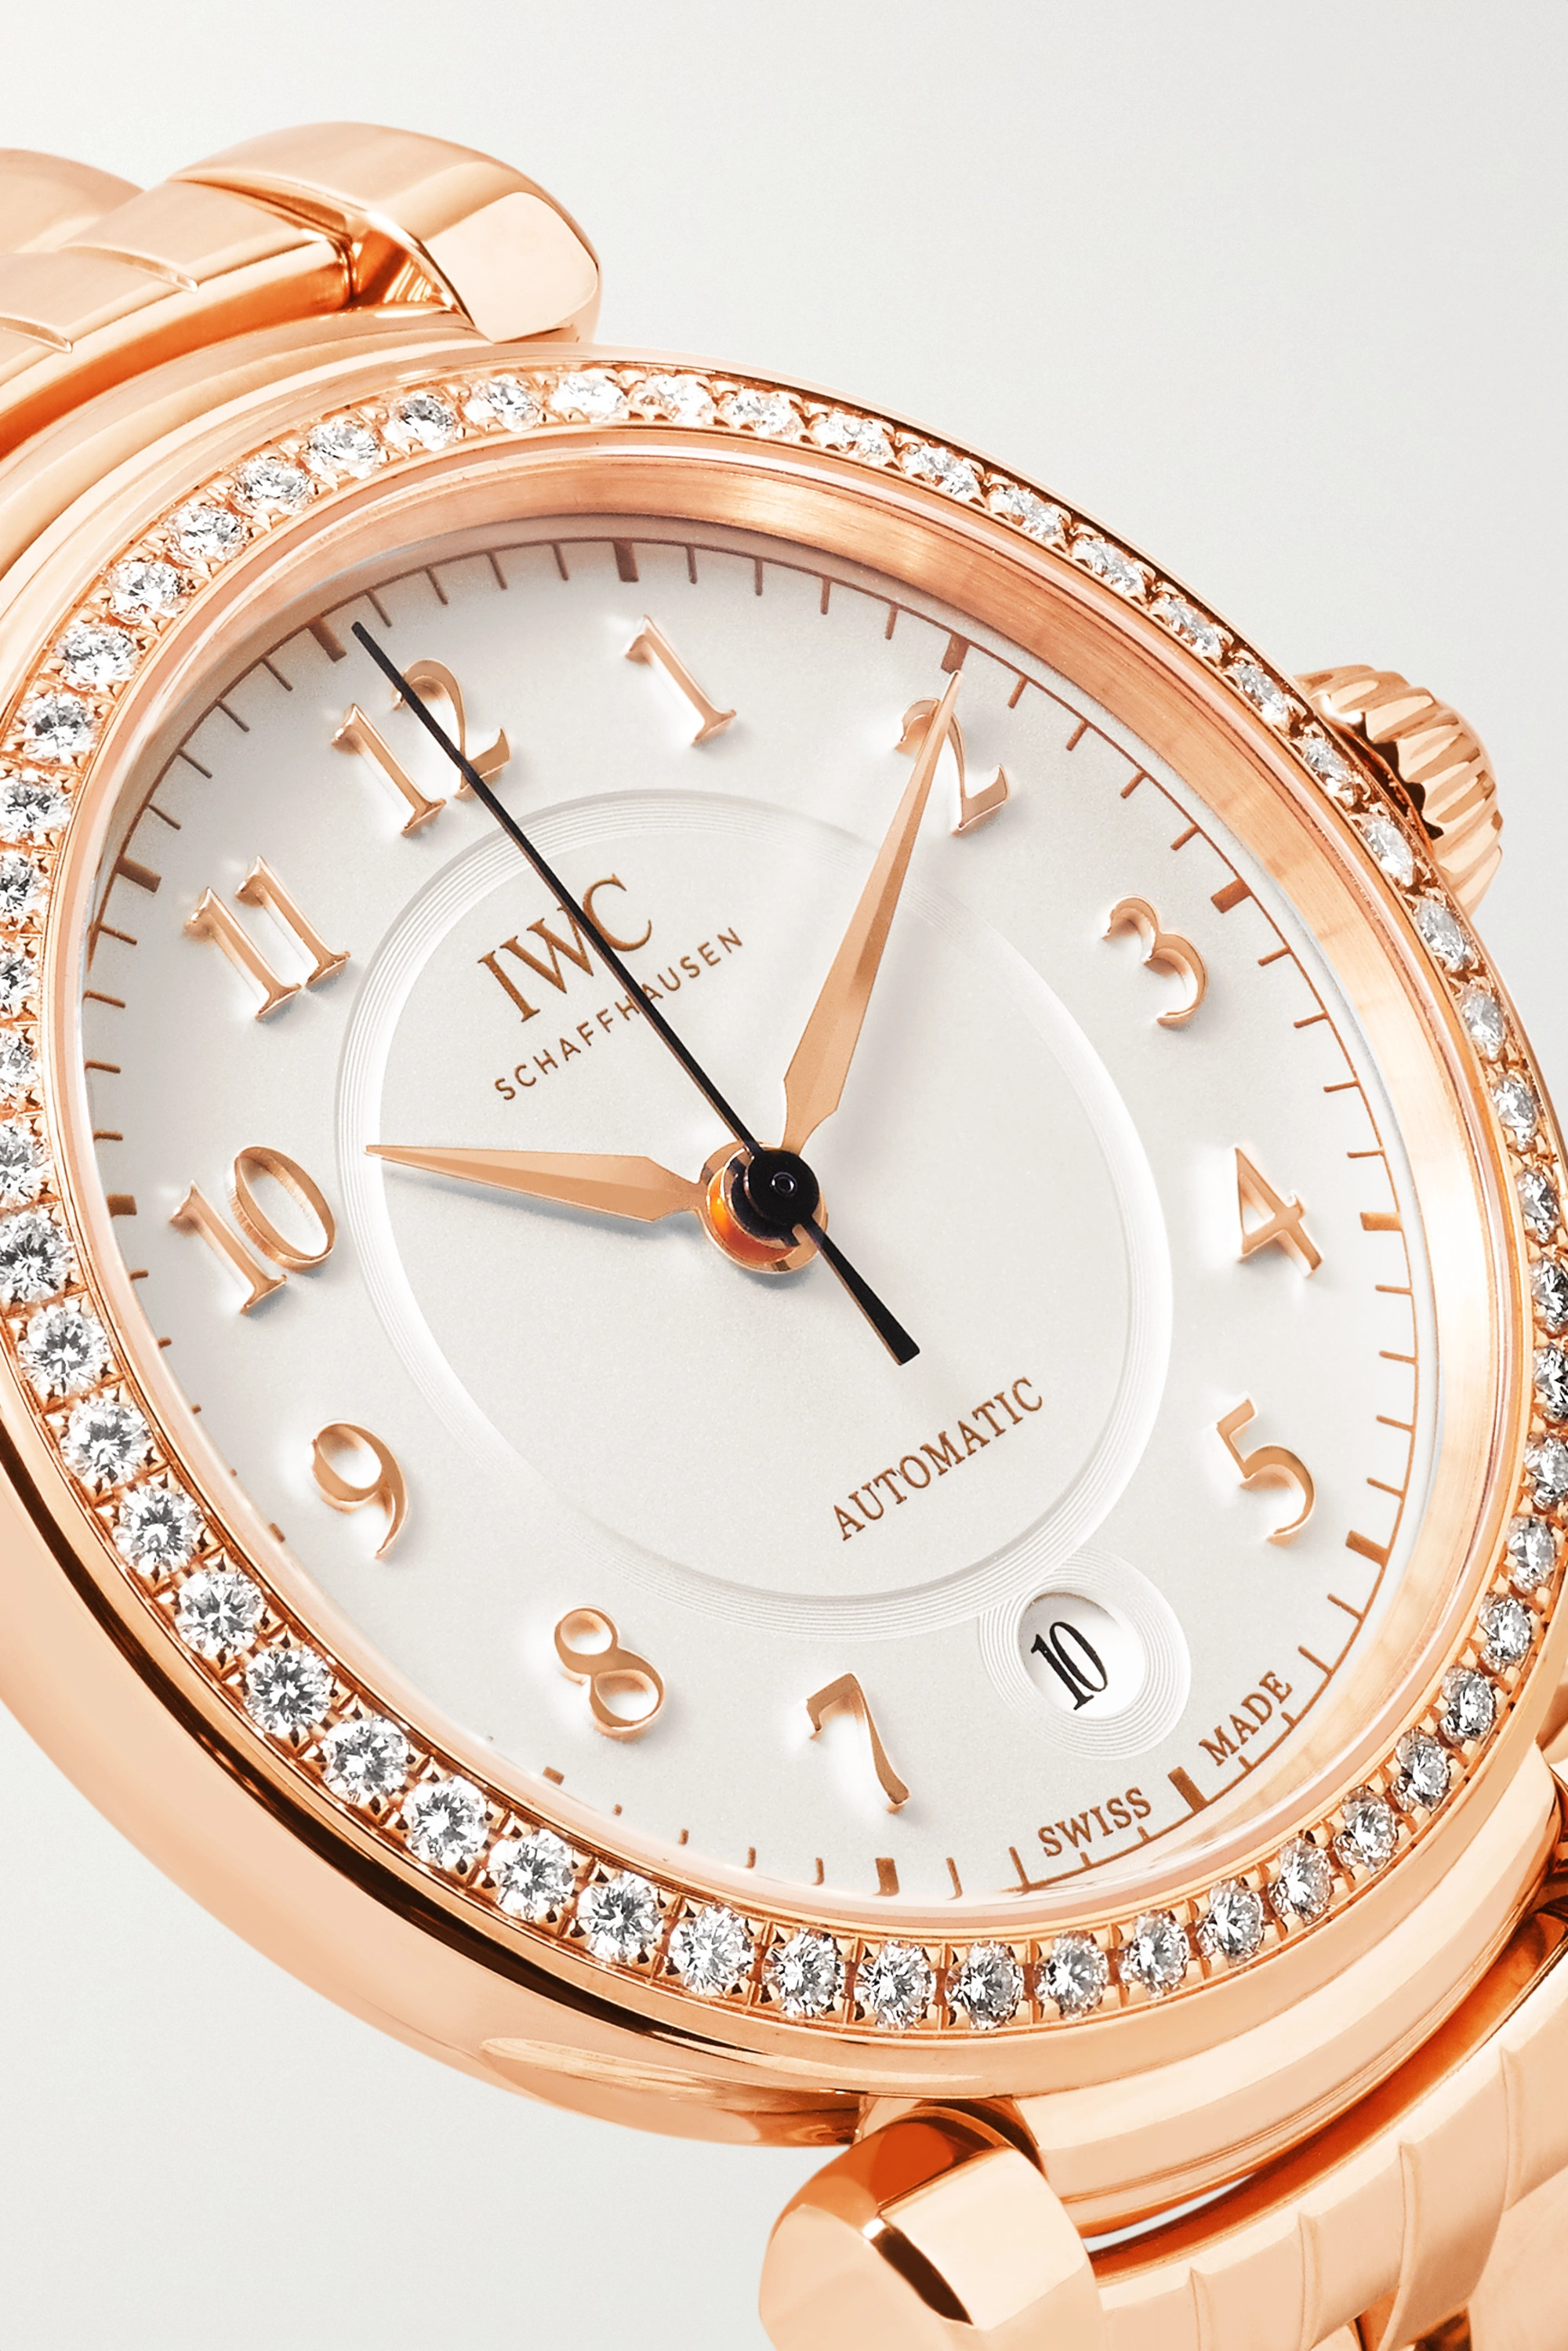 IWC SCHAFFHAUSEN Da Vinci Automatic 36 18-karat red gold diamond watch